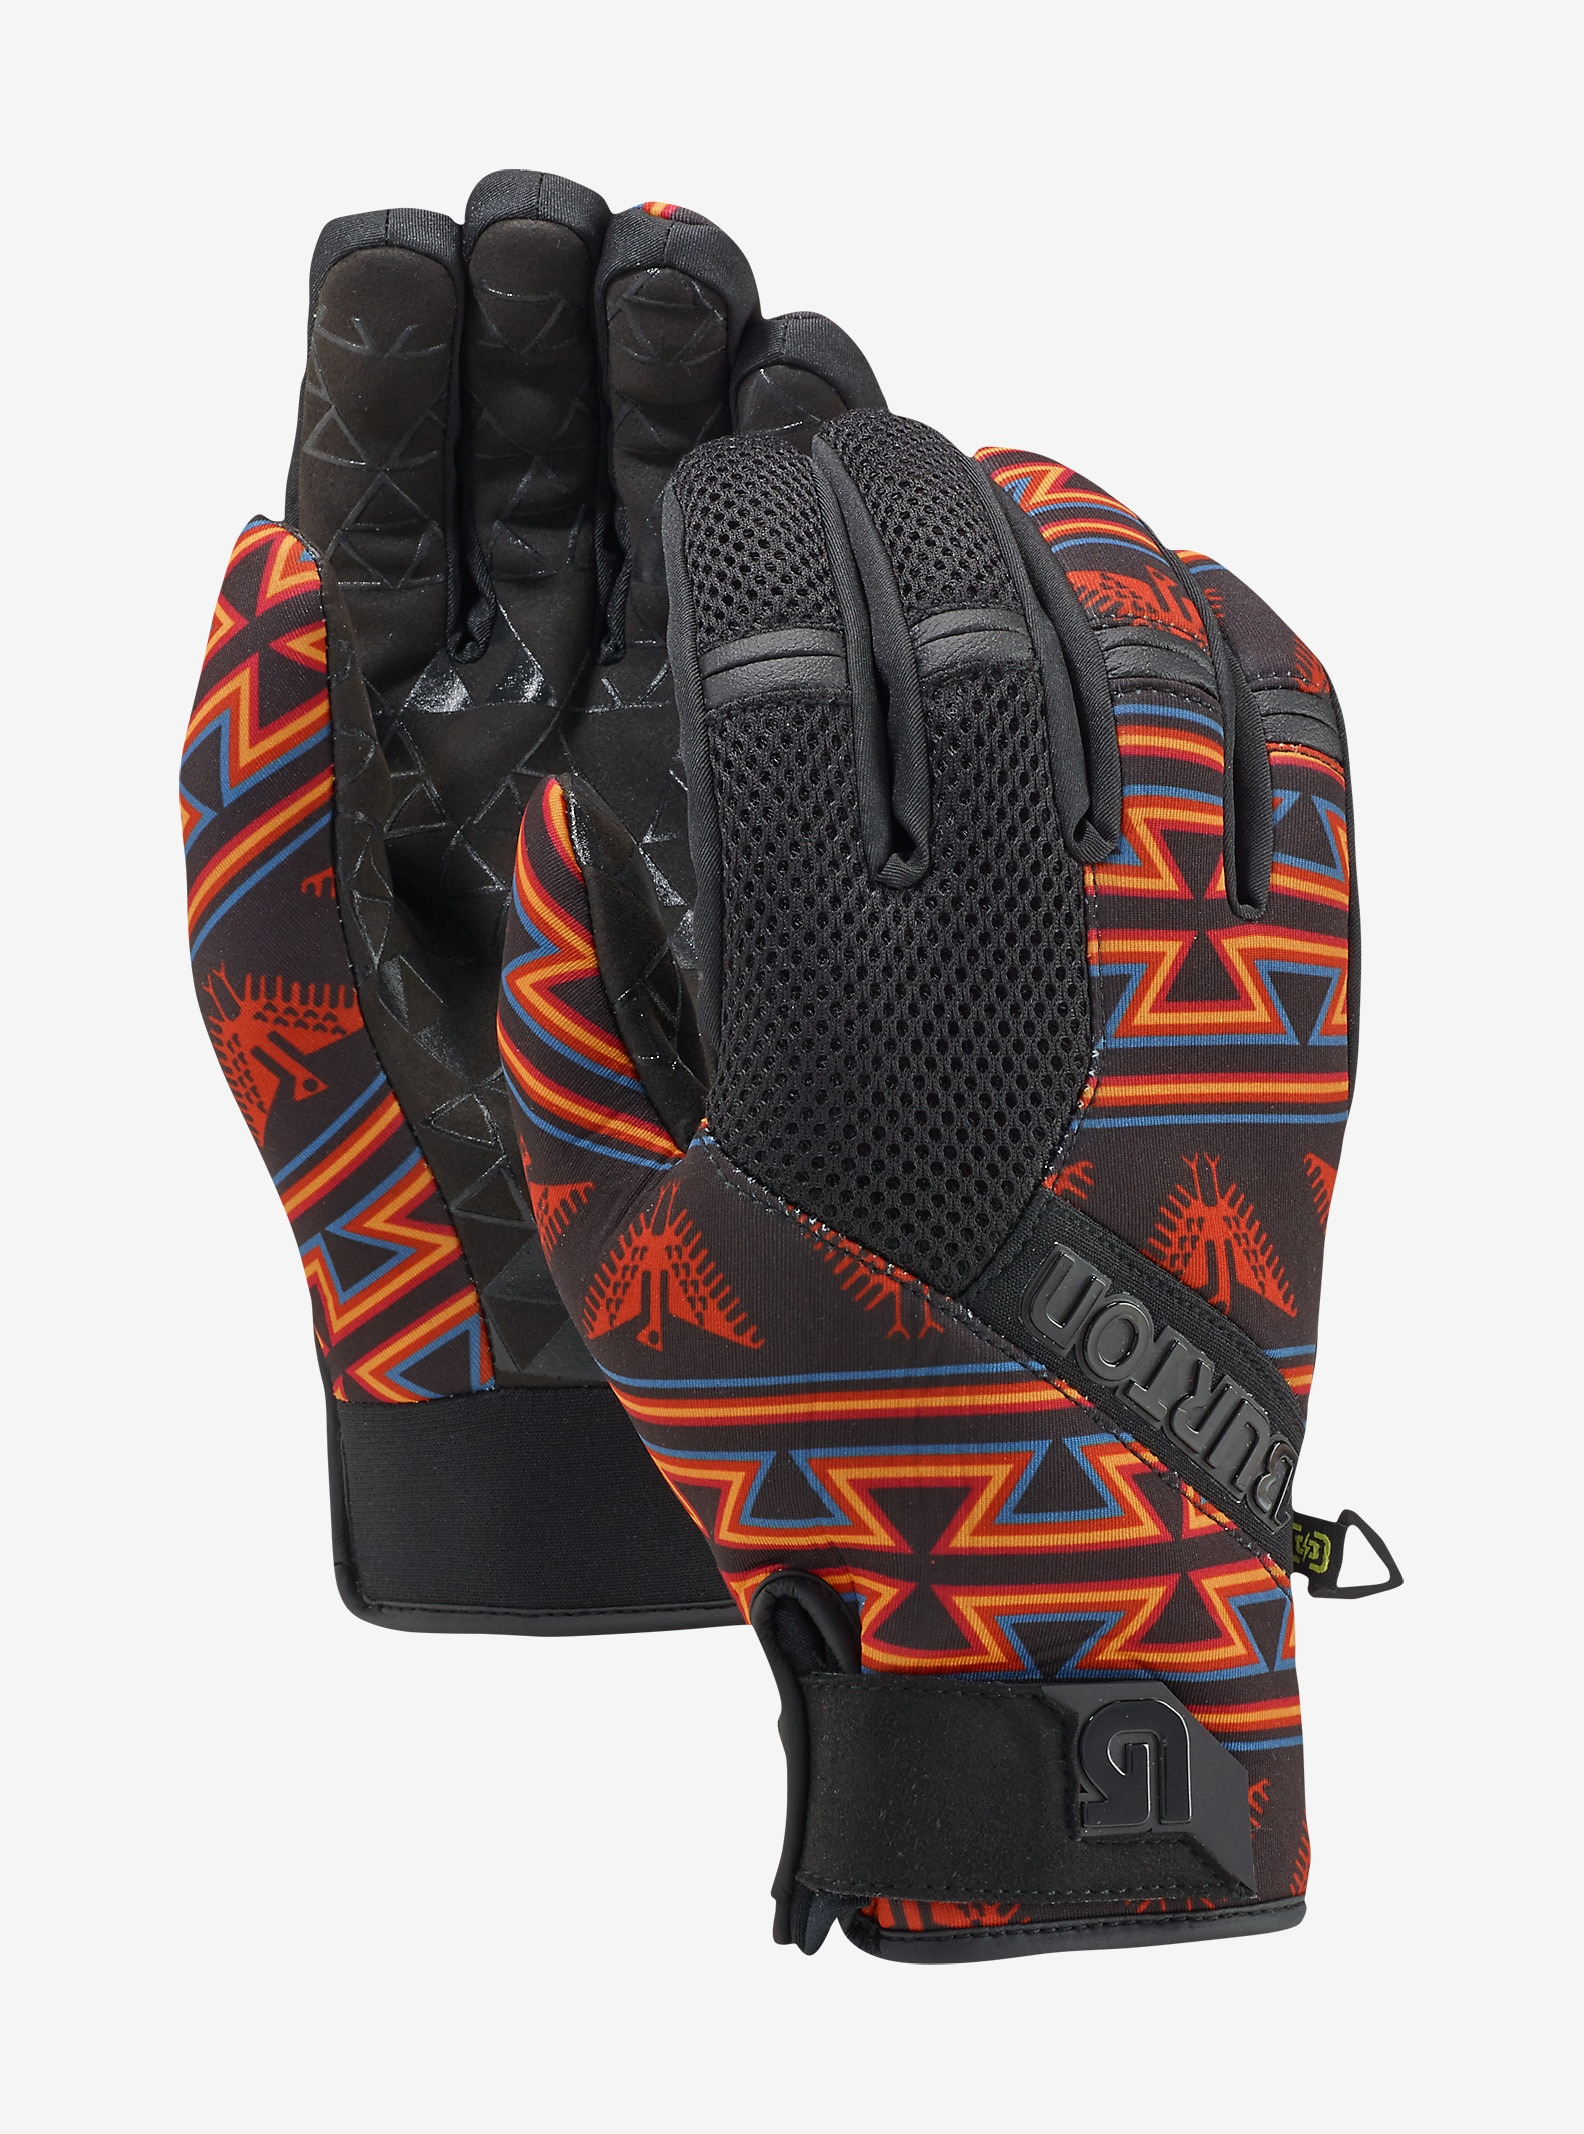 Burton Park Glove shown in Baja